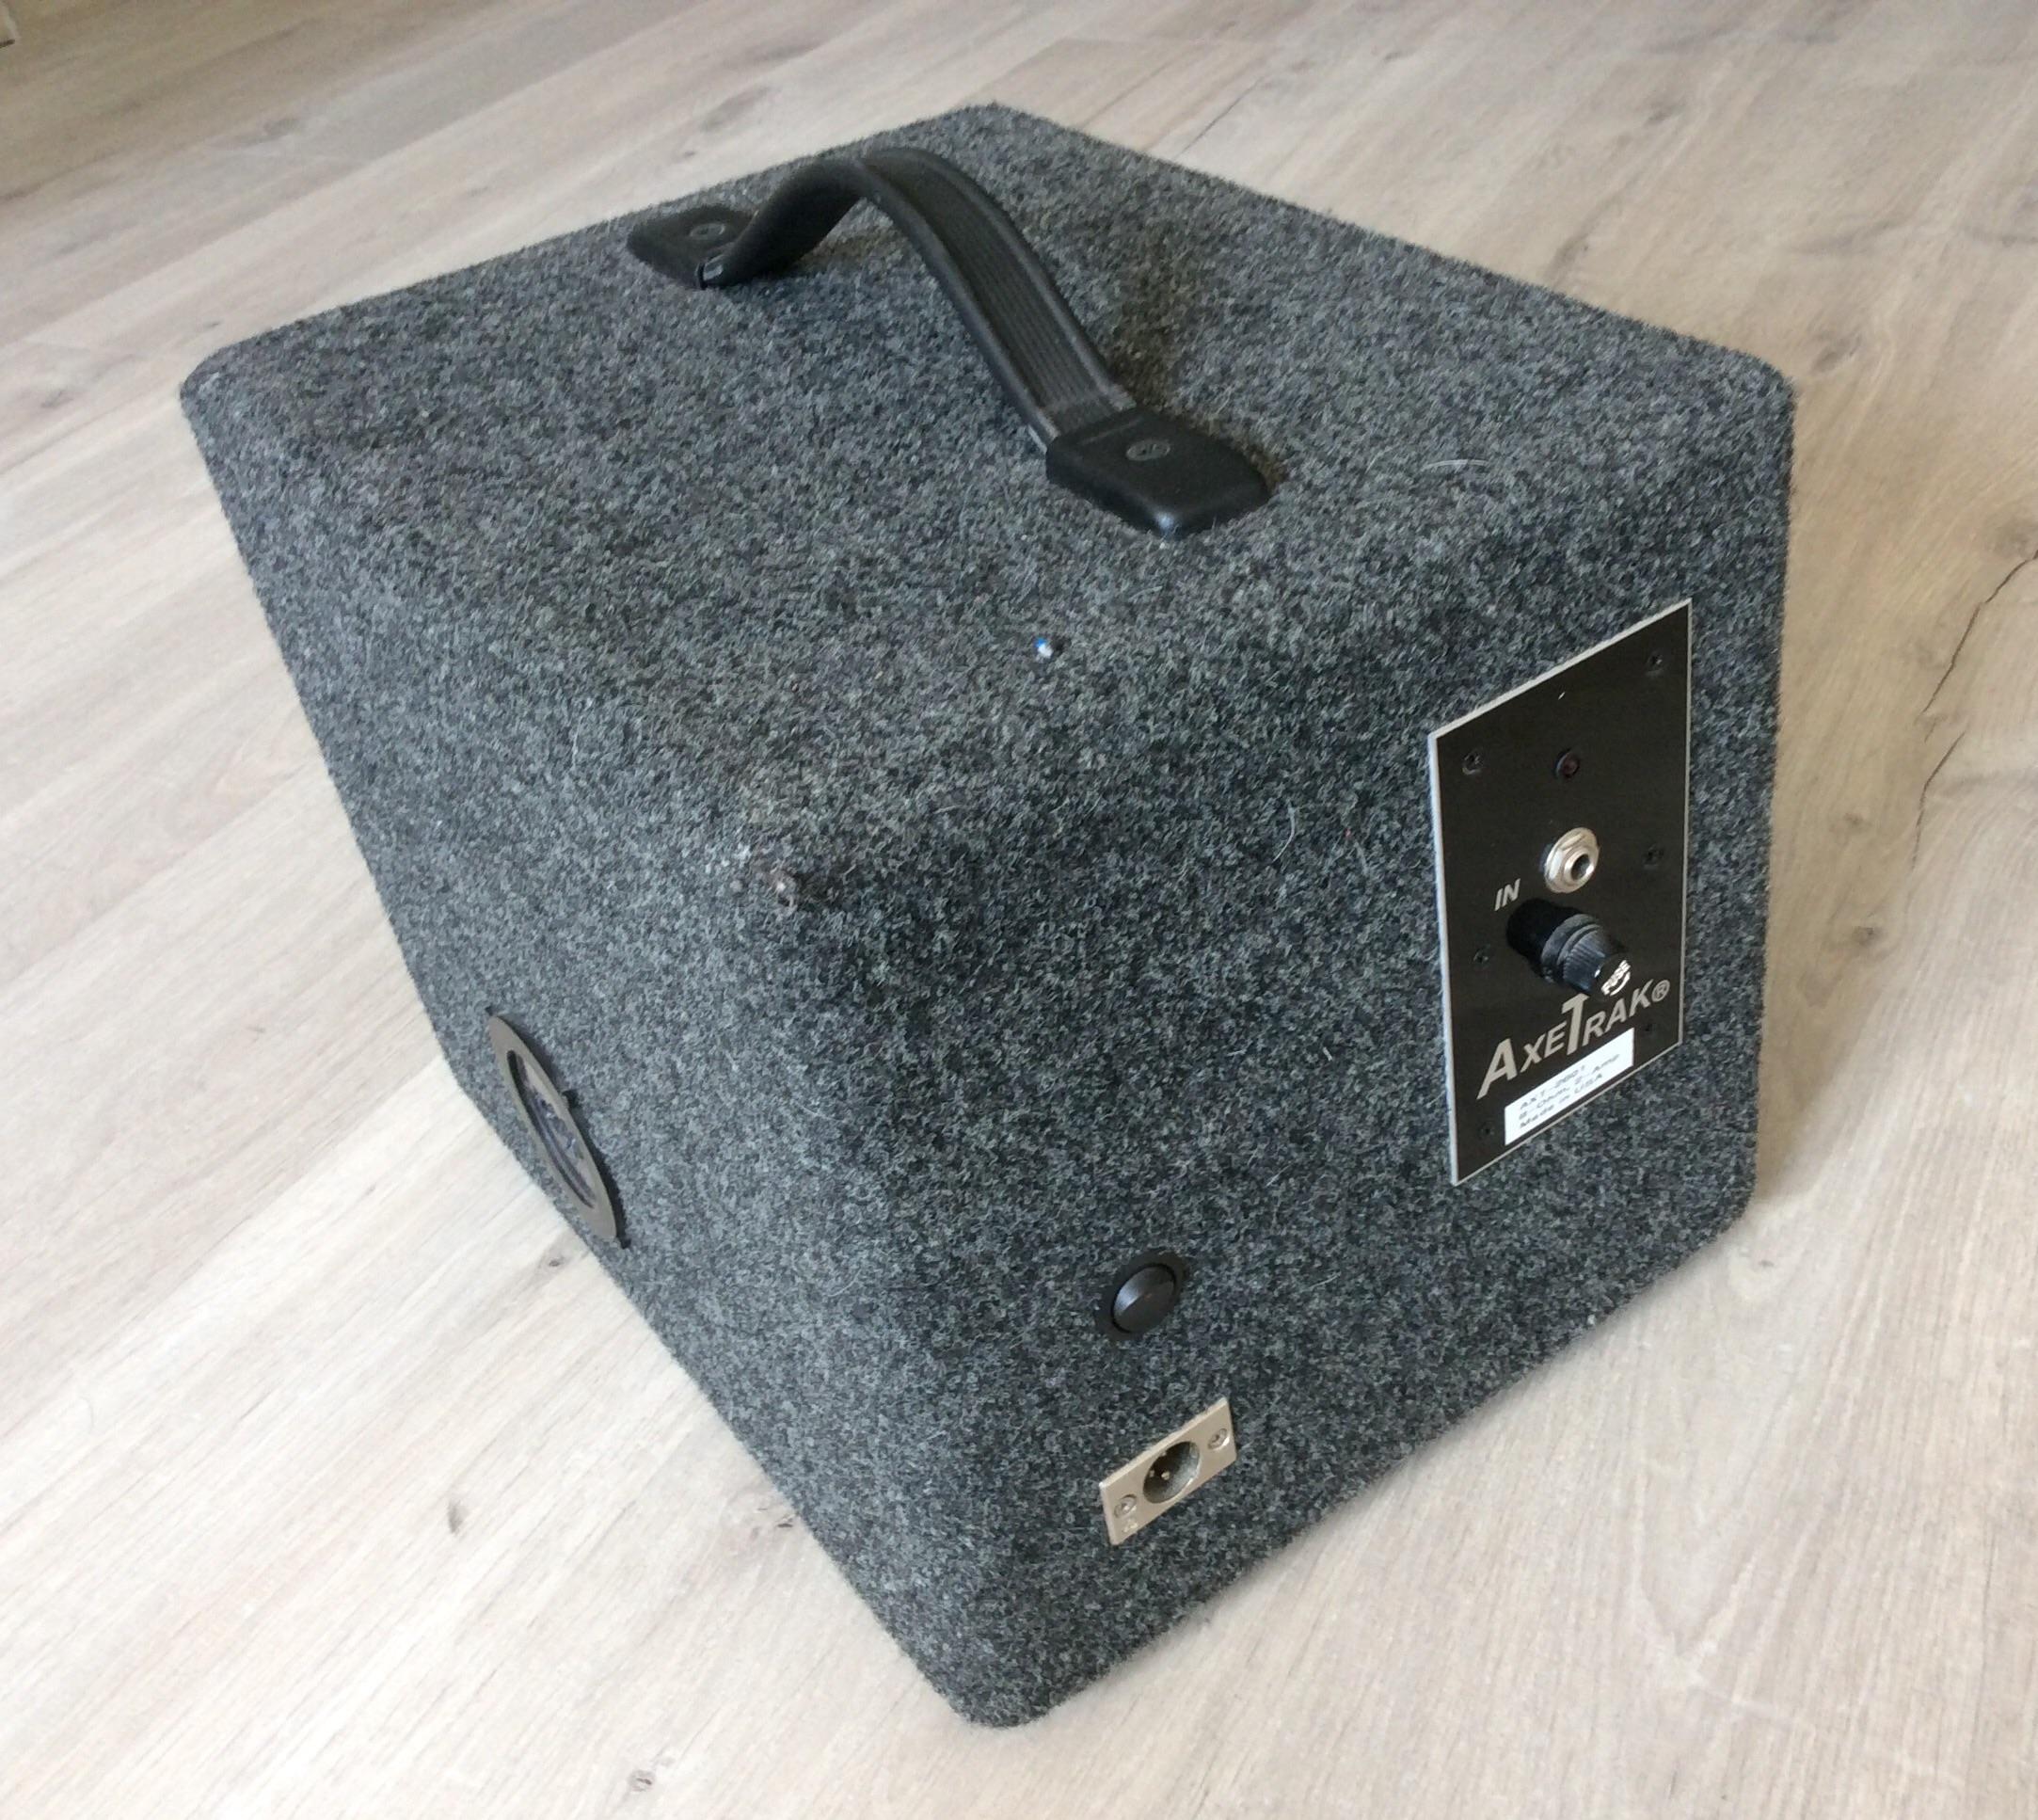 jlh products axetrak isolation cabinet image 342642 audiofanzine. Black Bedroom Furniture Sets. Home Design Ideas